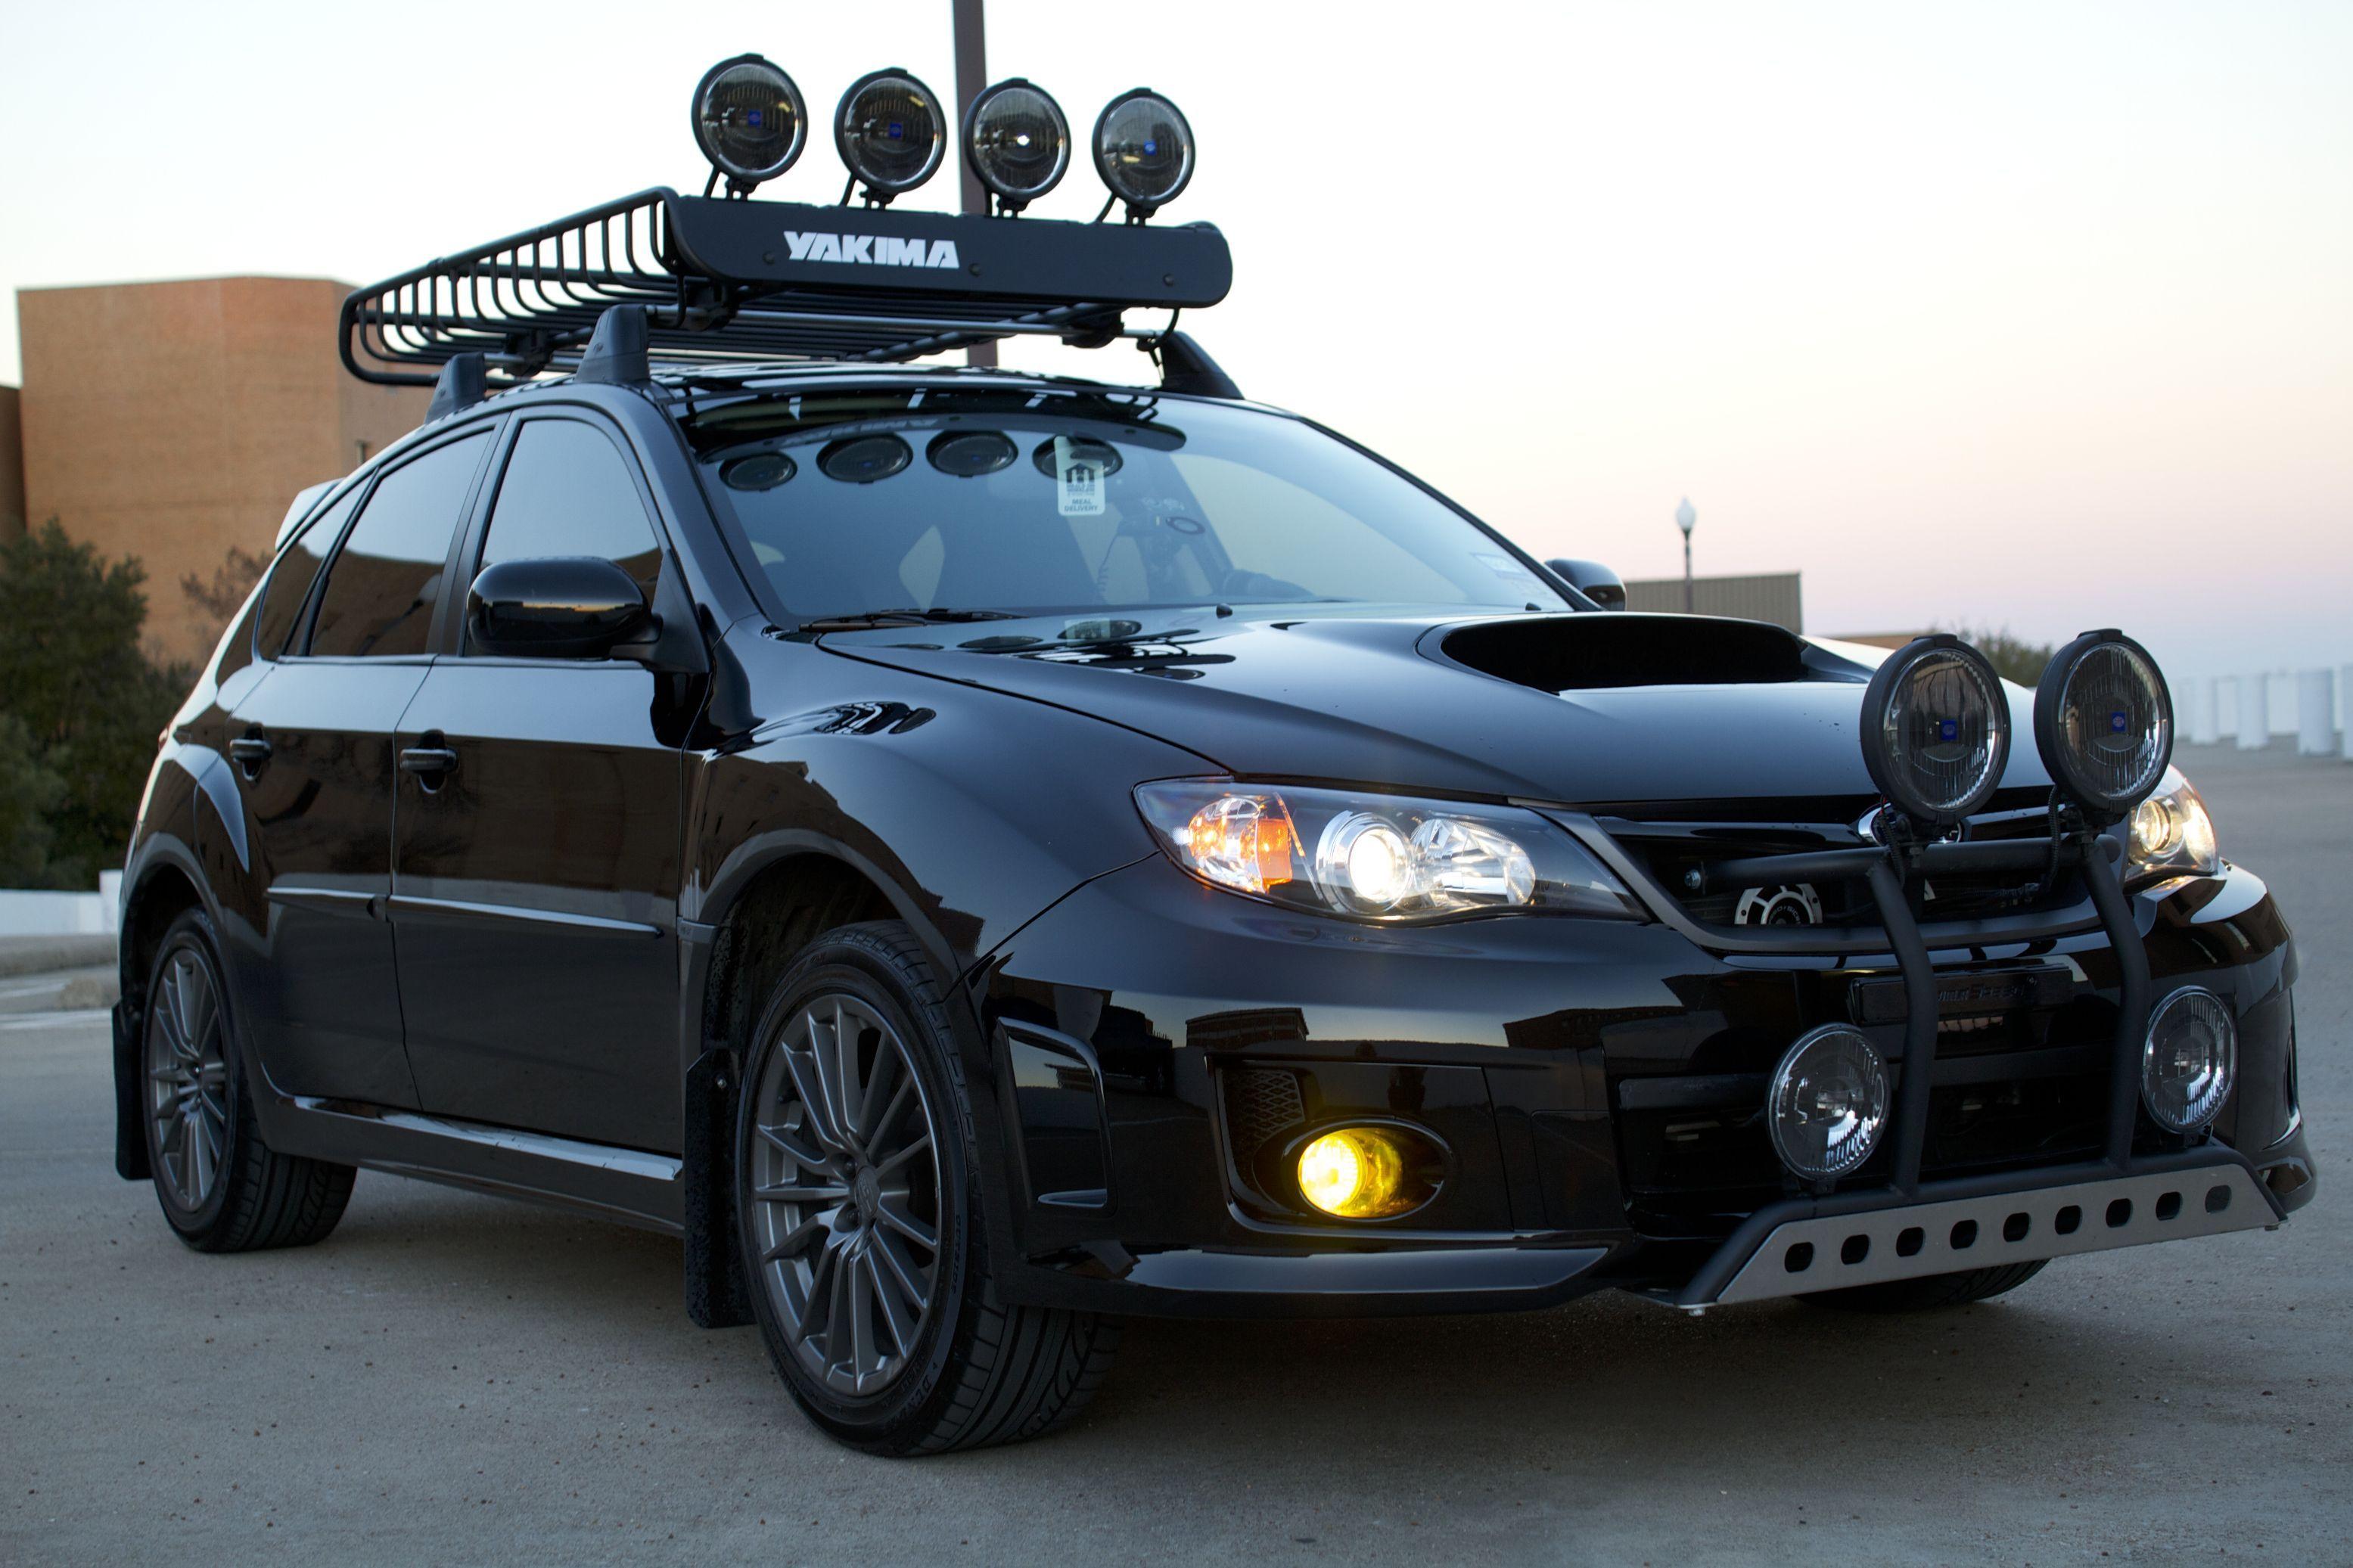 Lifted Impreza Google Search Subaru Cars Impreza Lifted Subaru